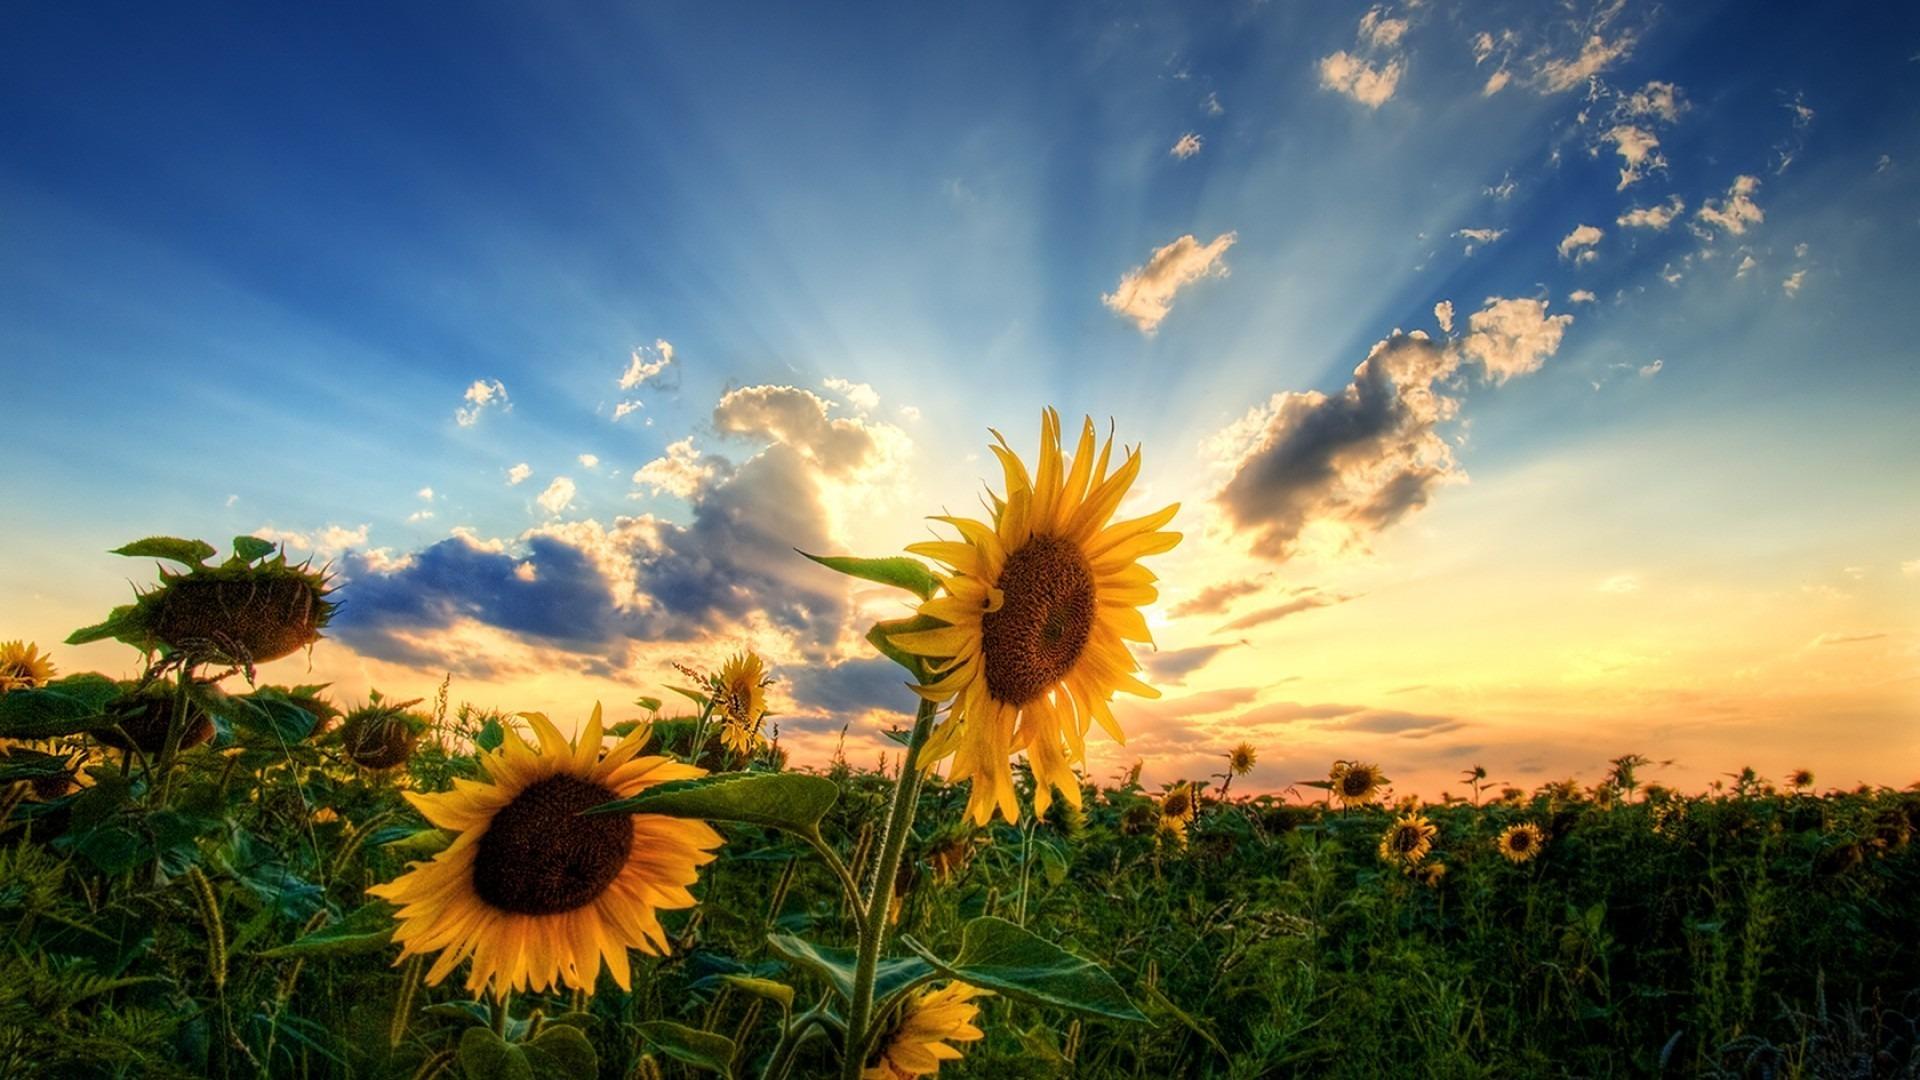 подсолнухи поле sunflowers field  № 419078 бесплатно